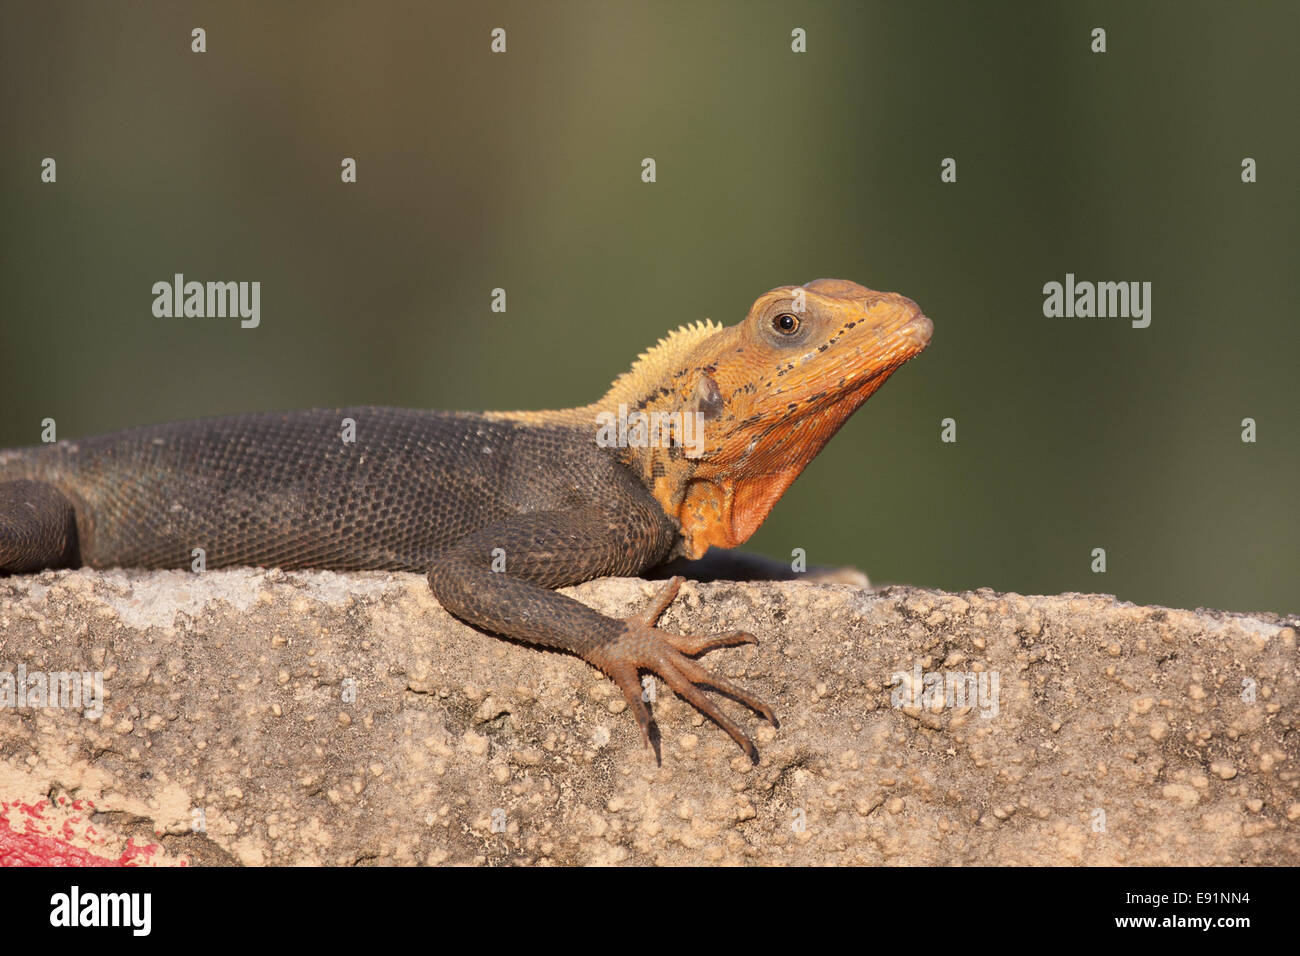 Male Agama taking Sunbath - Stock Image